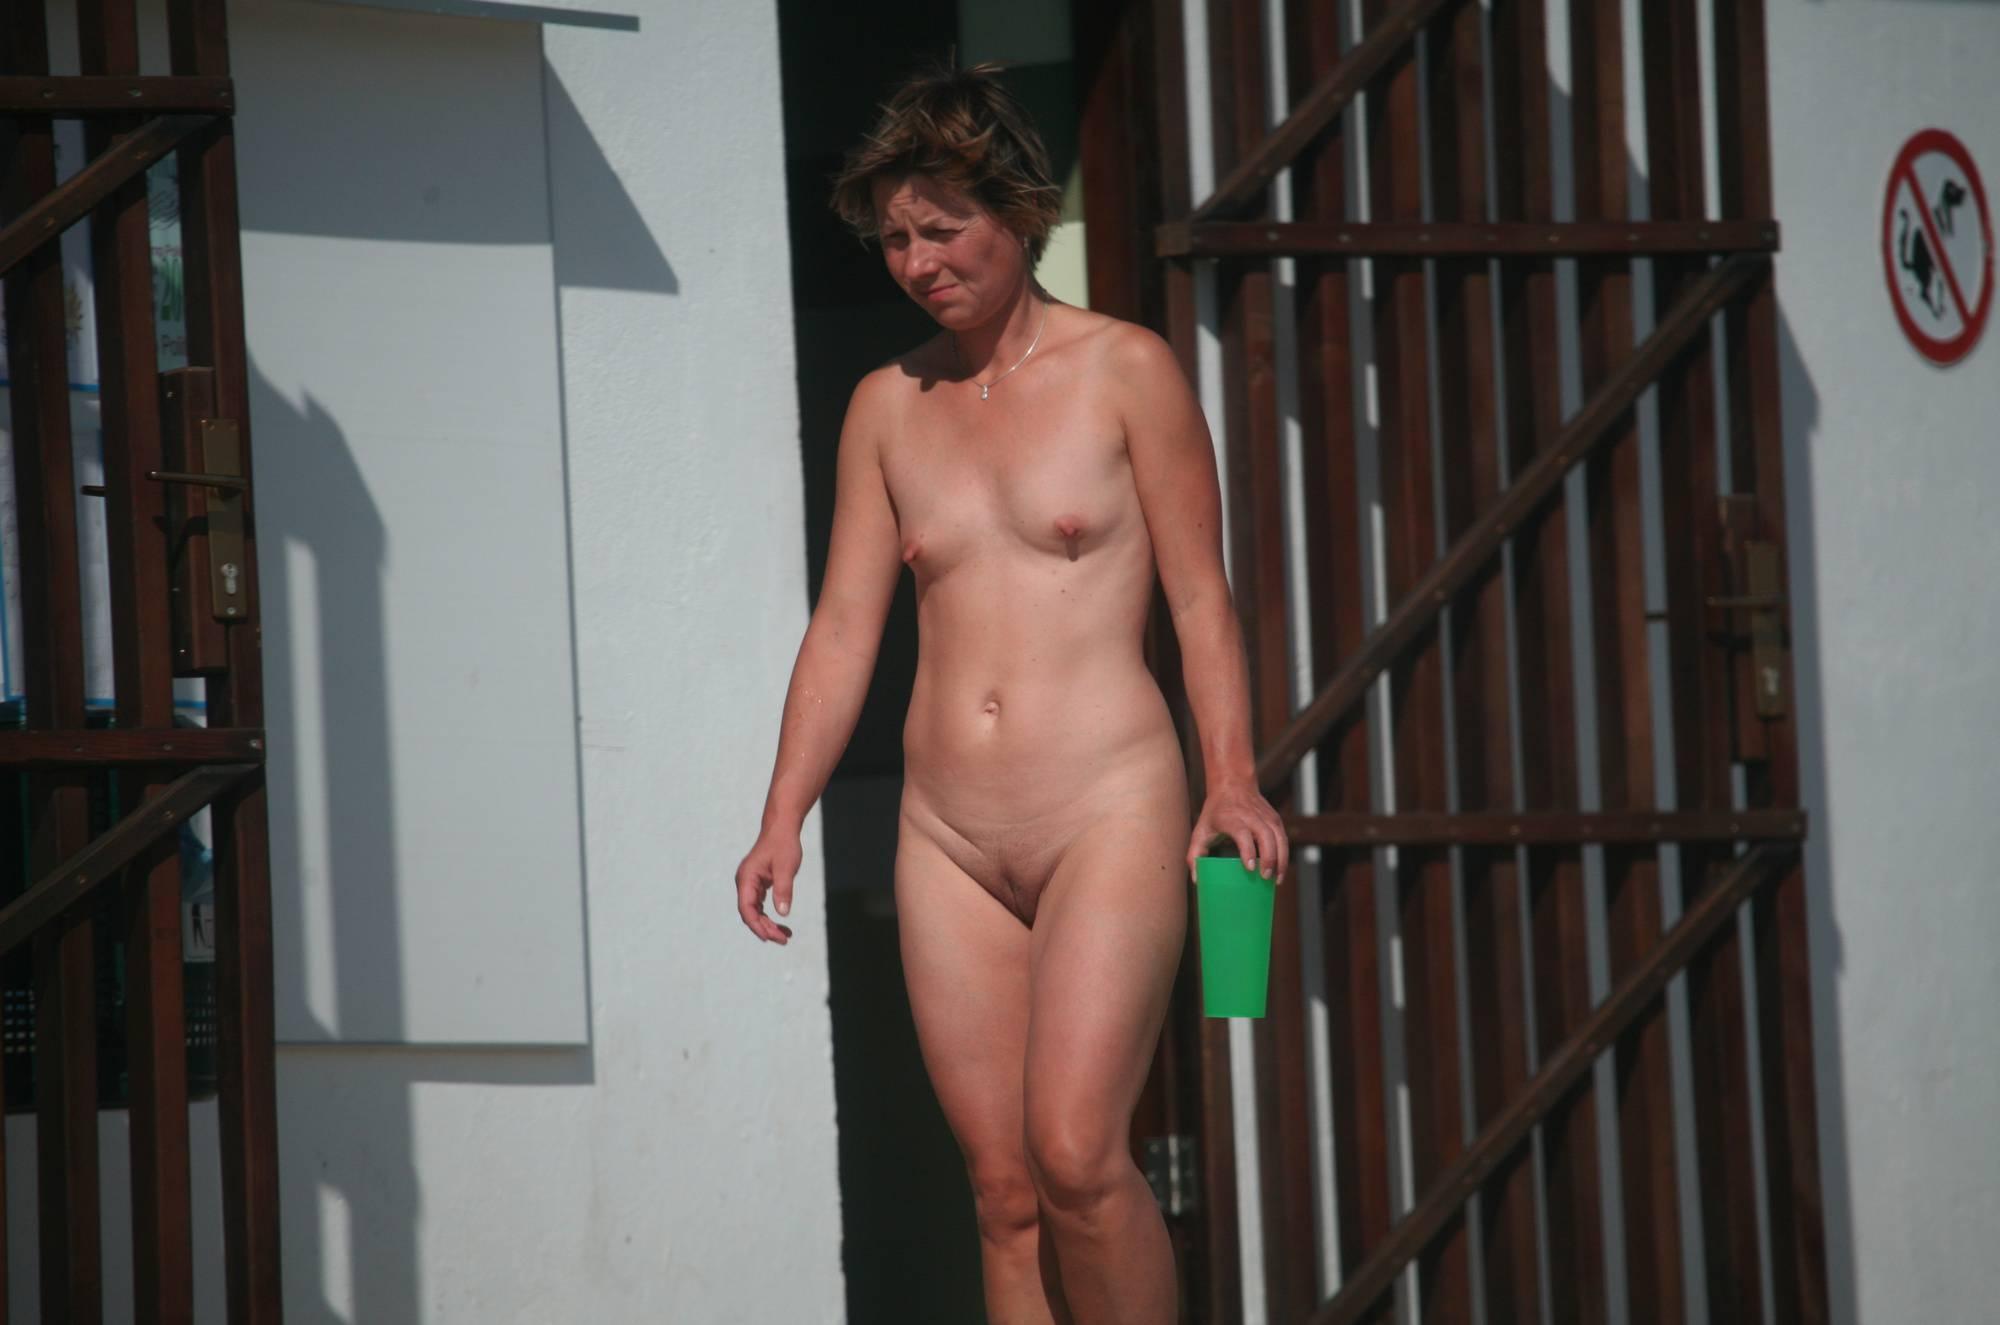 Nudist Pics Cove Club-House Visits - 1